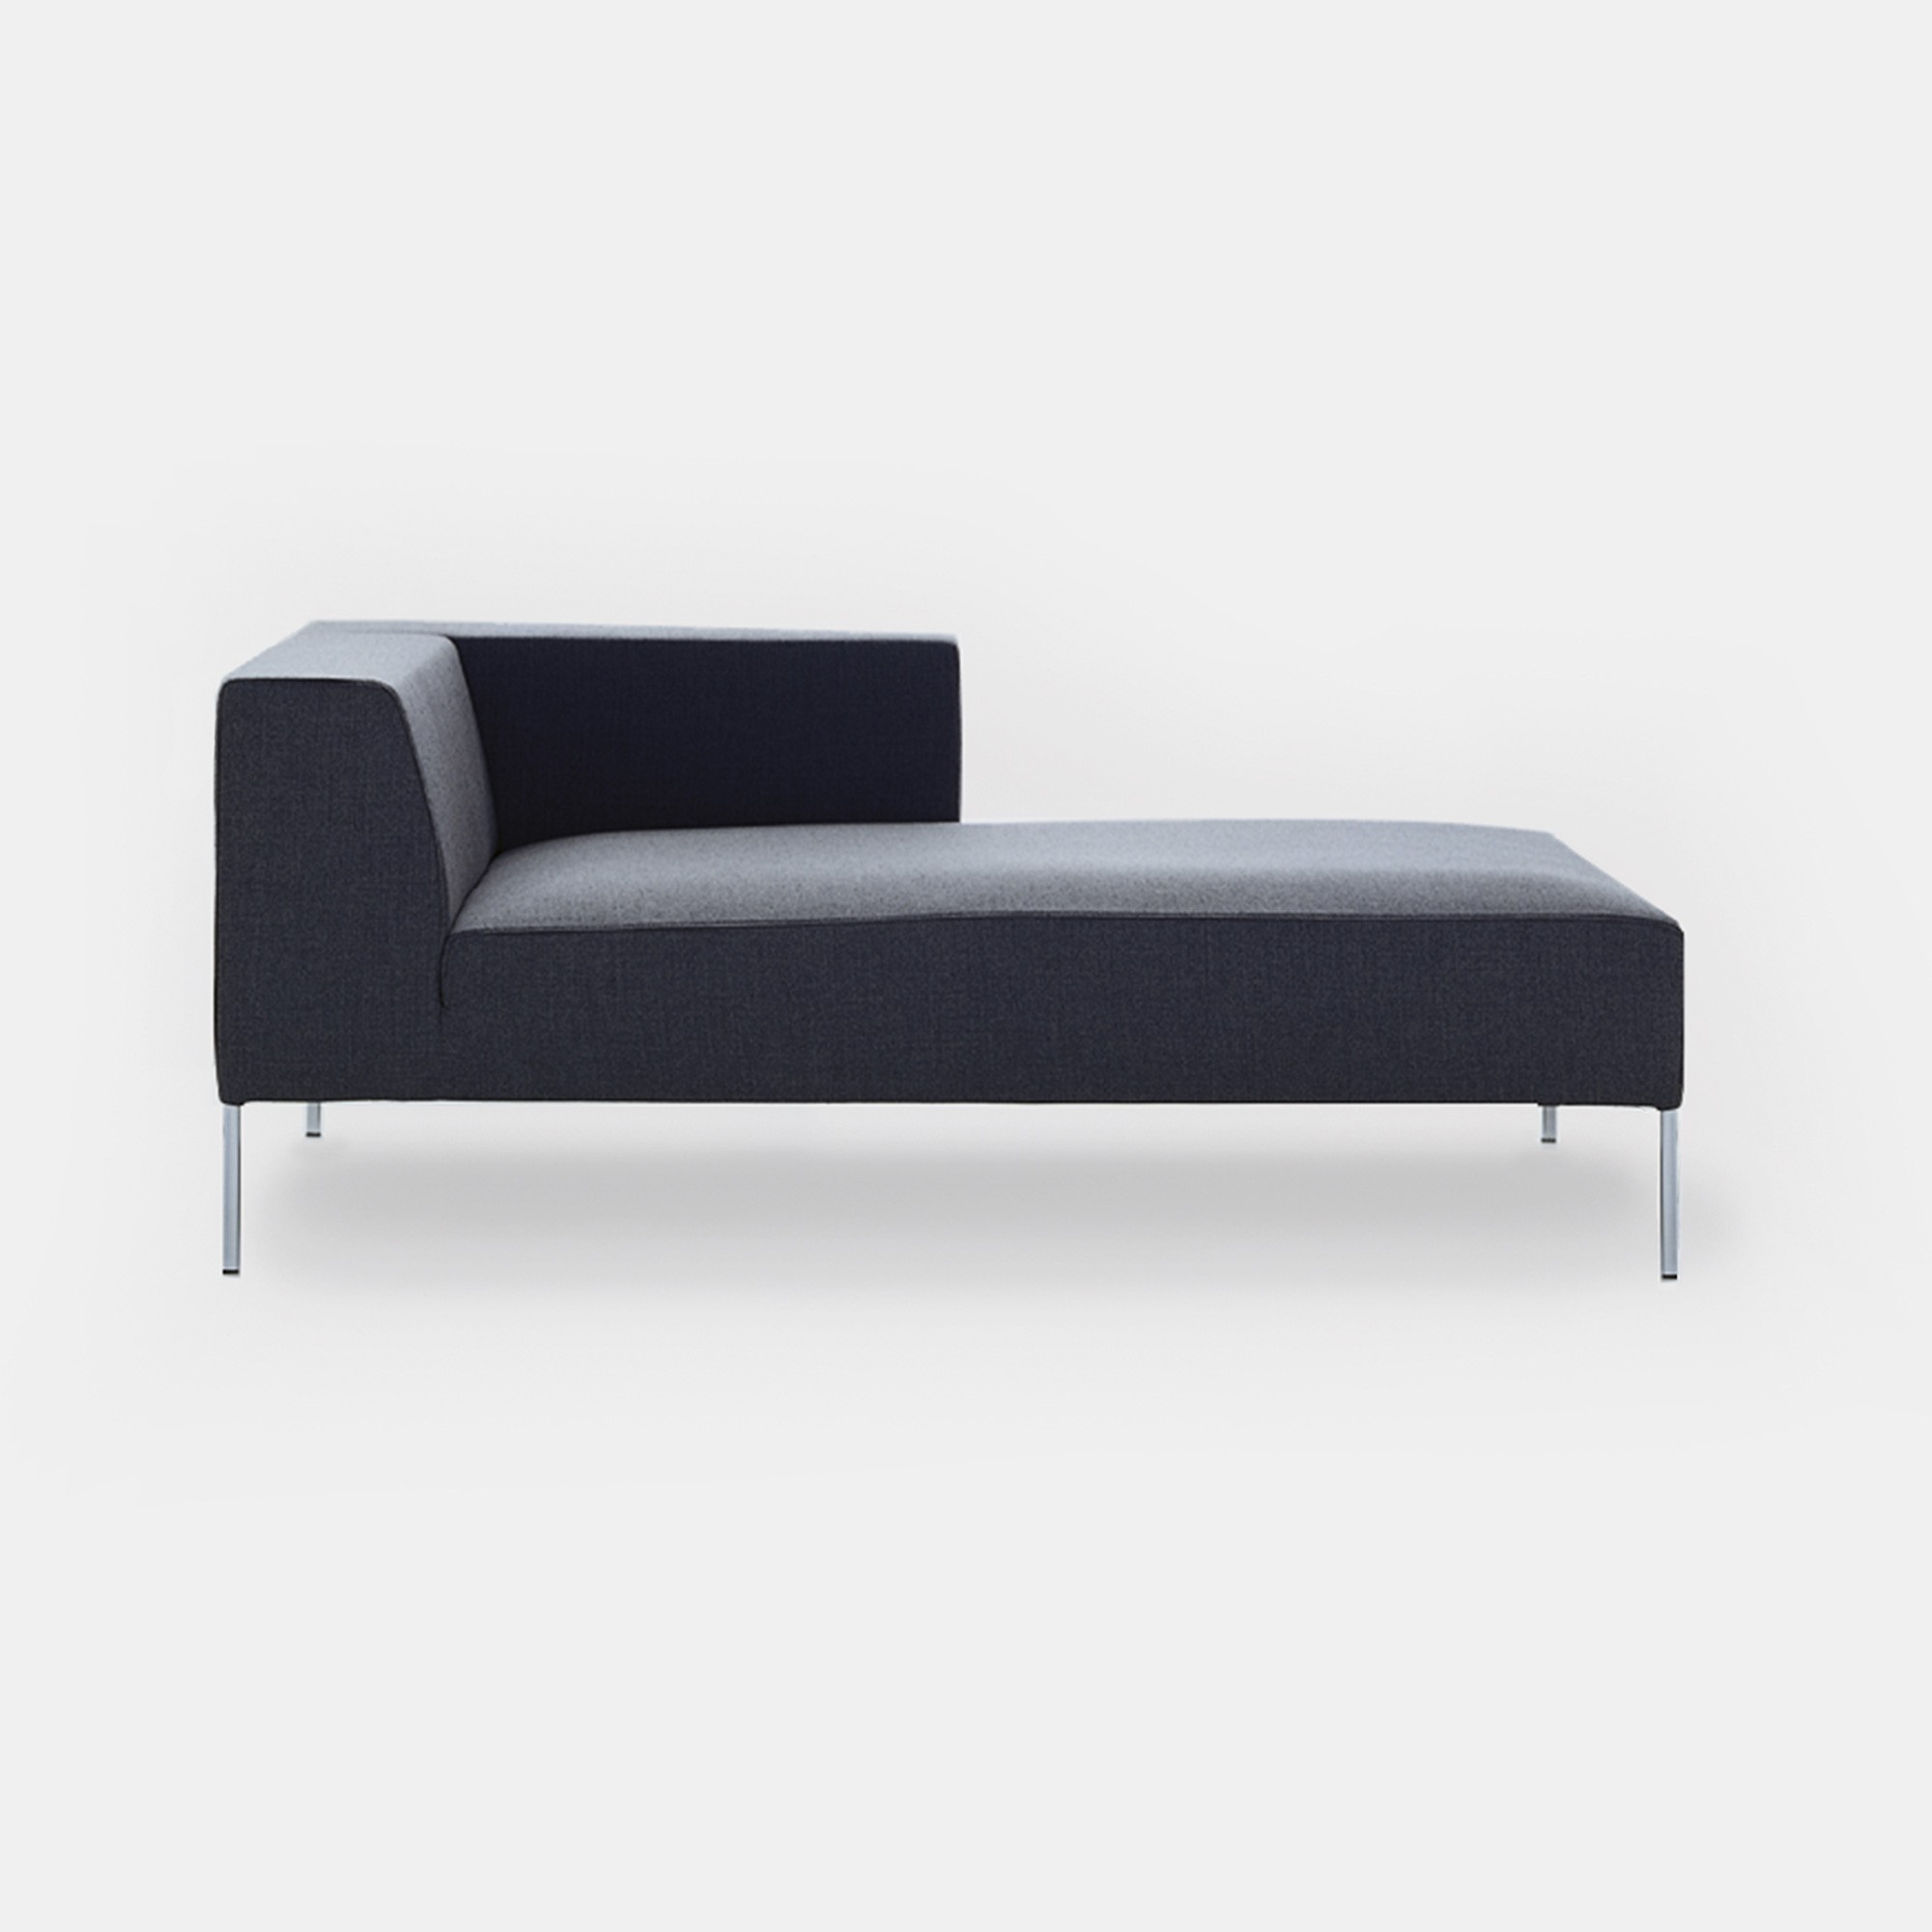 ALLEN 2 modular sofas system. MDF Italia.